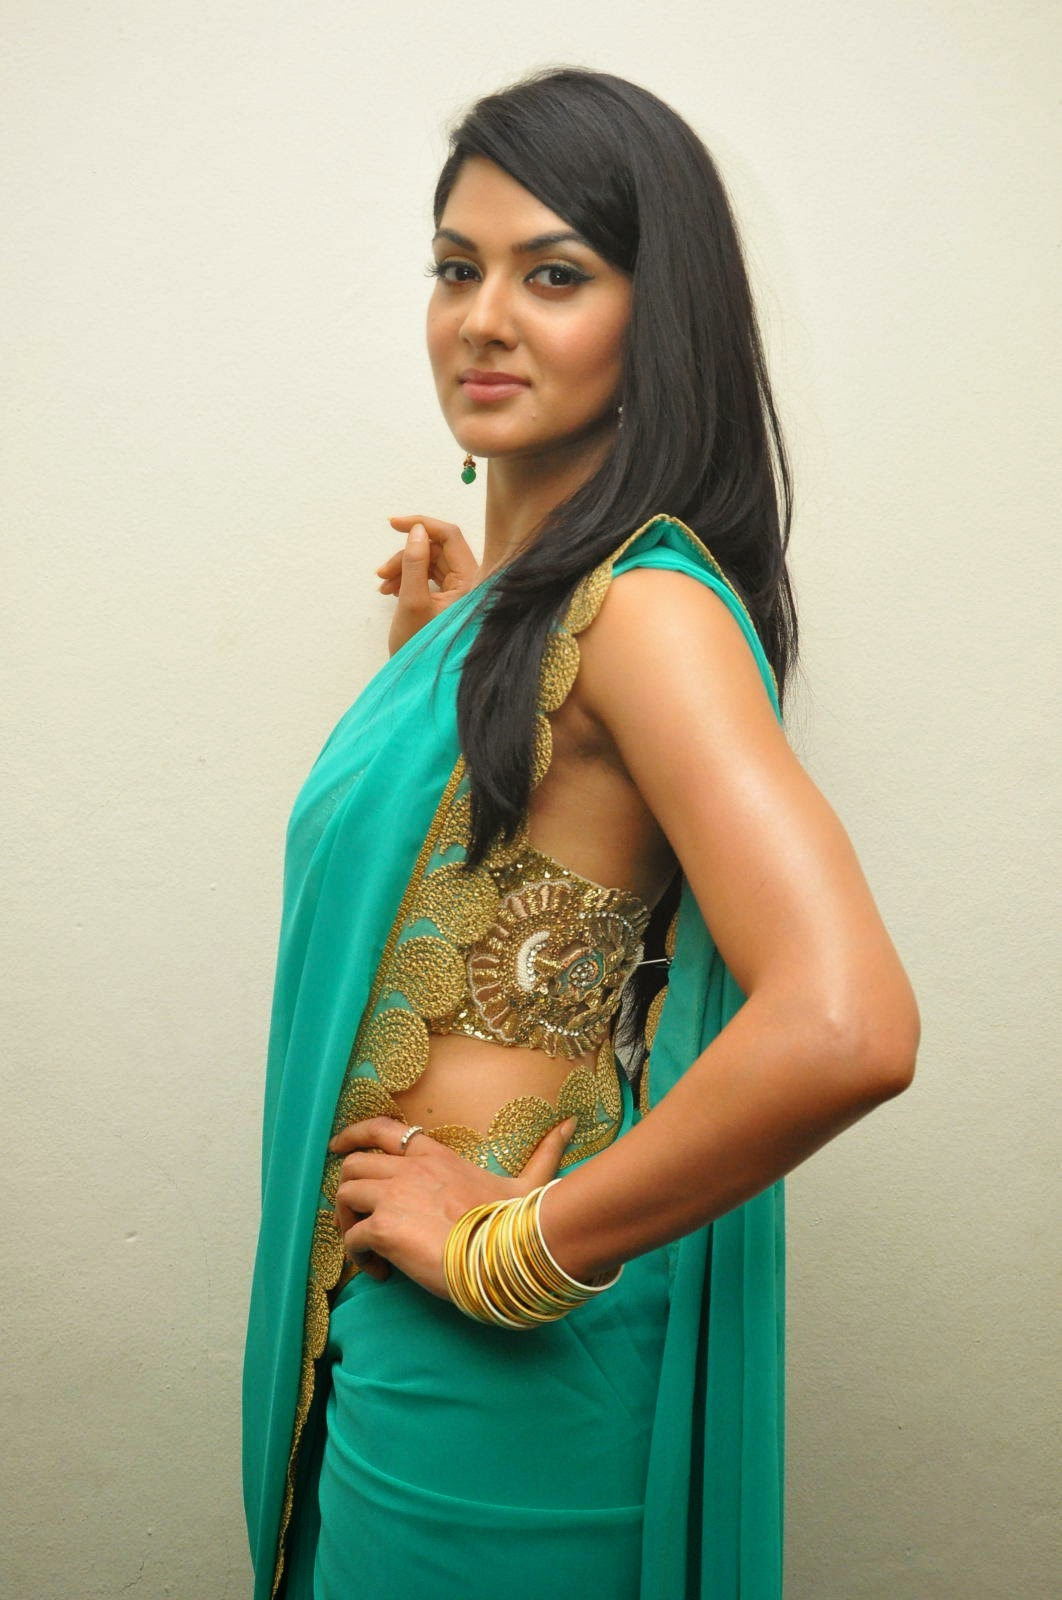 imgscr girl Sakshi-Chaudhary-Stills-At-James-Bond-Movie-Audio-Launch+%285%29.jpg  (1062×1600) | Celebrities | Pinterest